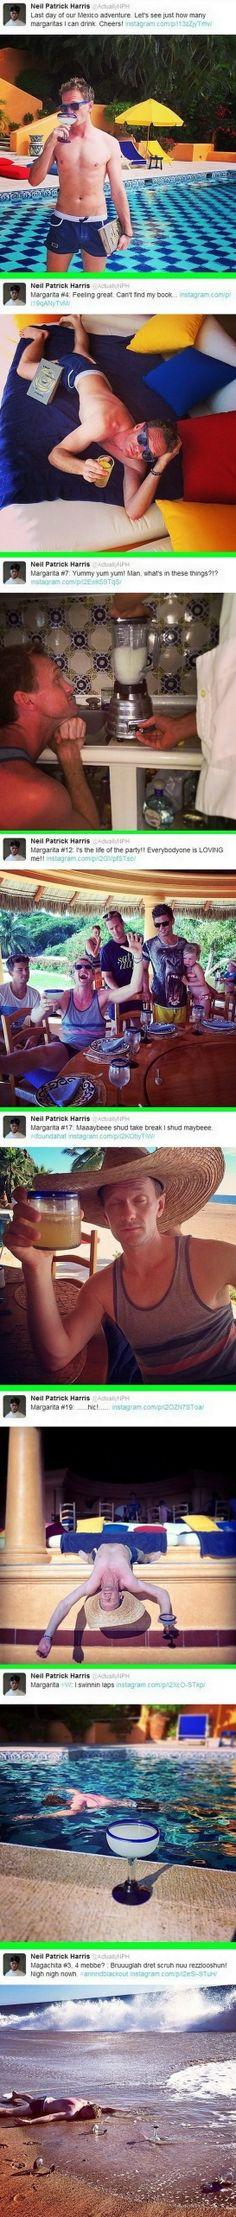 Neil Patrick Harris being awesome - www.meme-lol.com